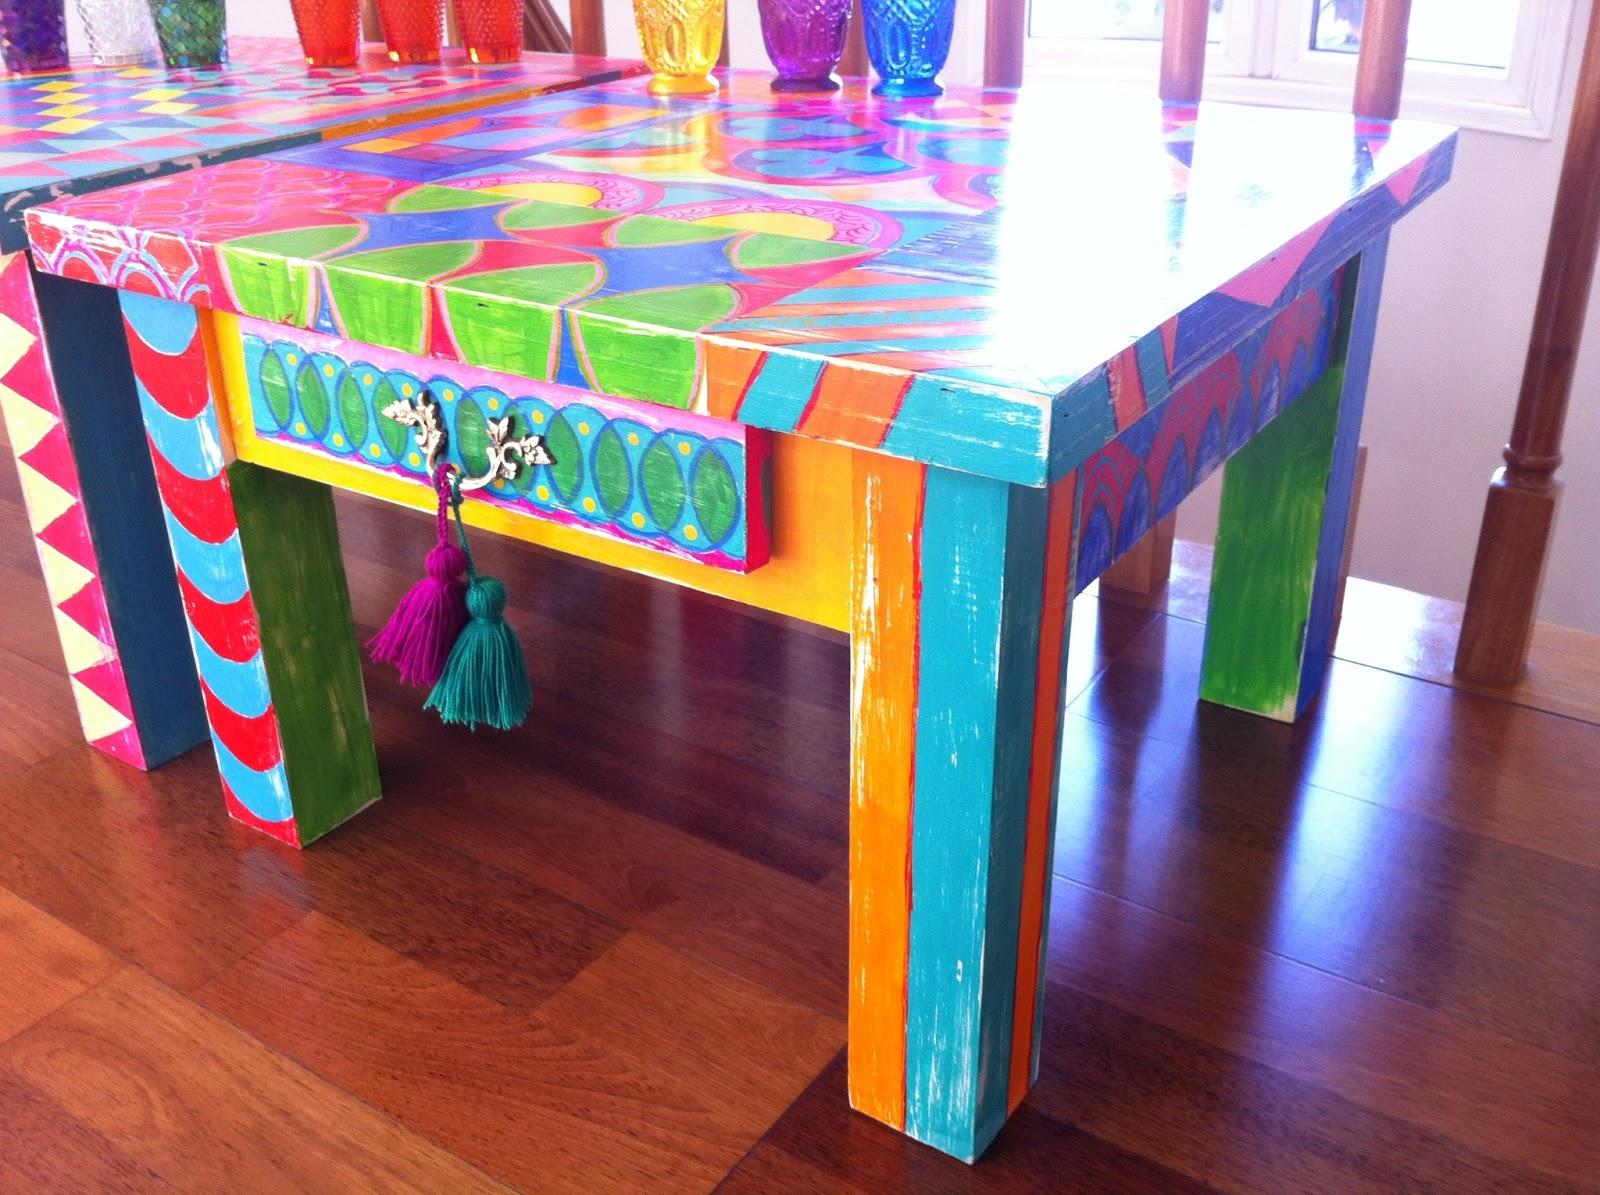 Vintouch muebles reciclados pintados a mano mesas - Disenos muebles pintados ...